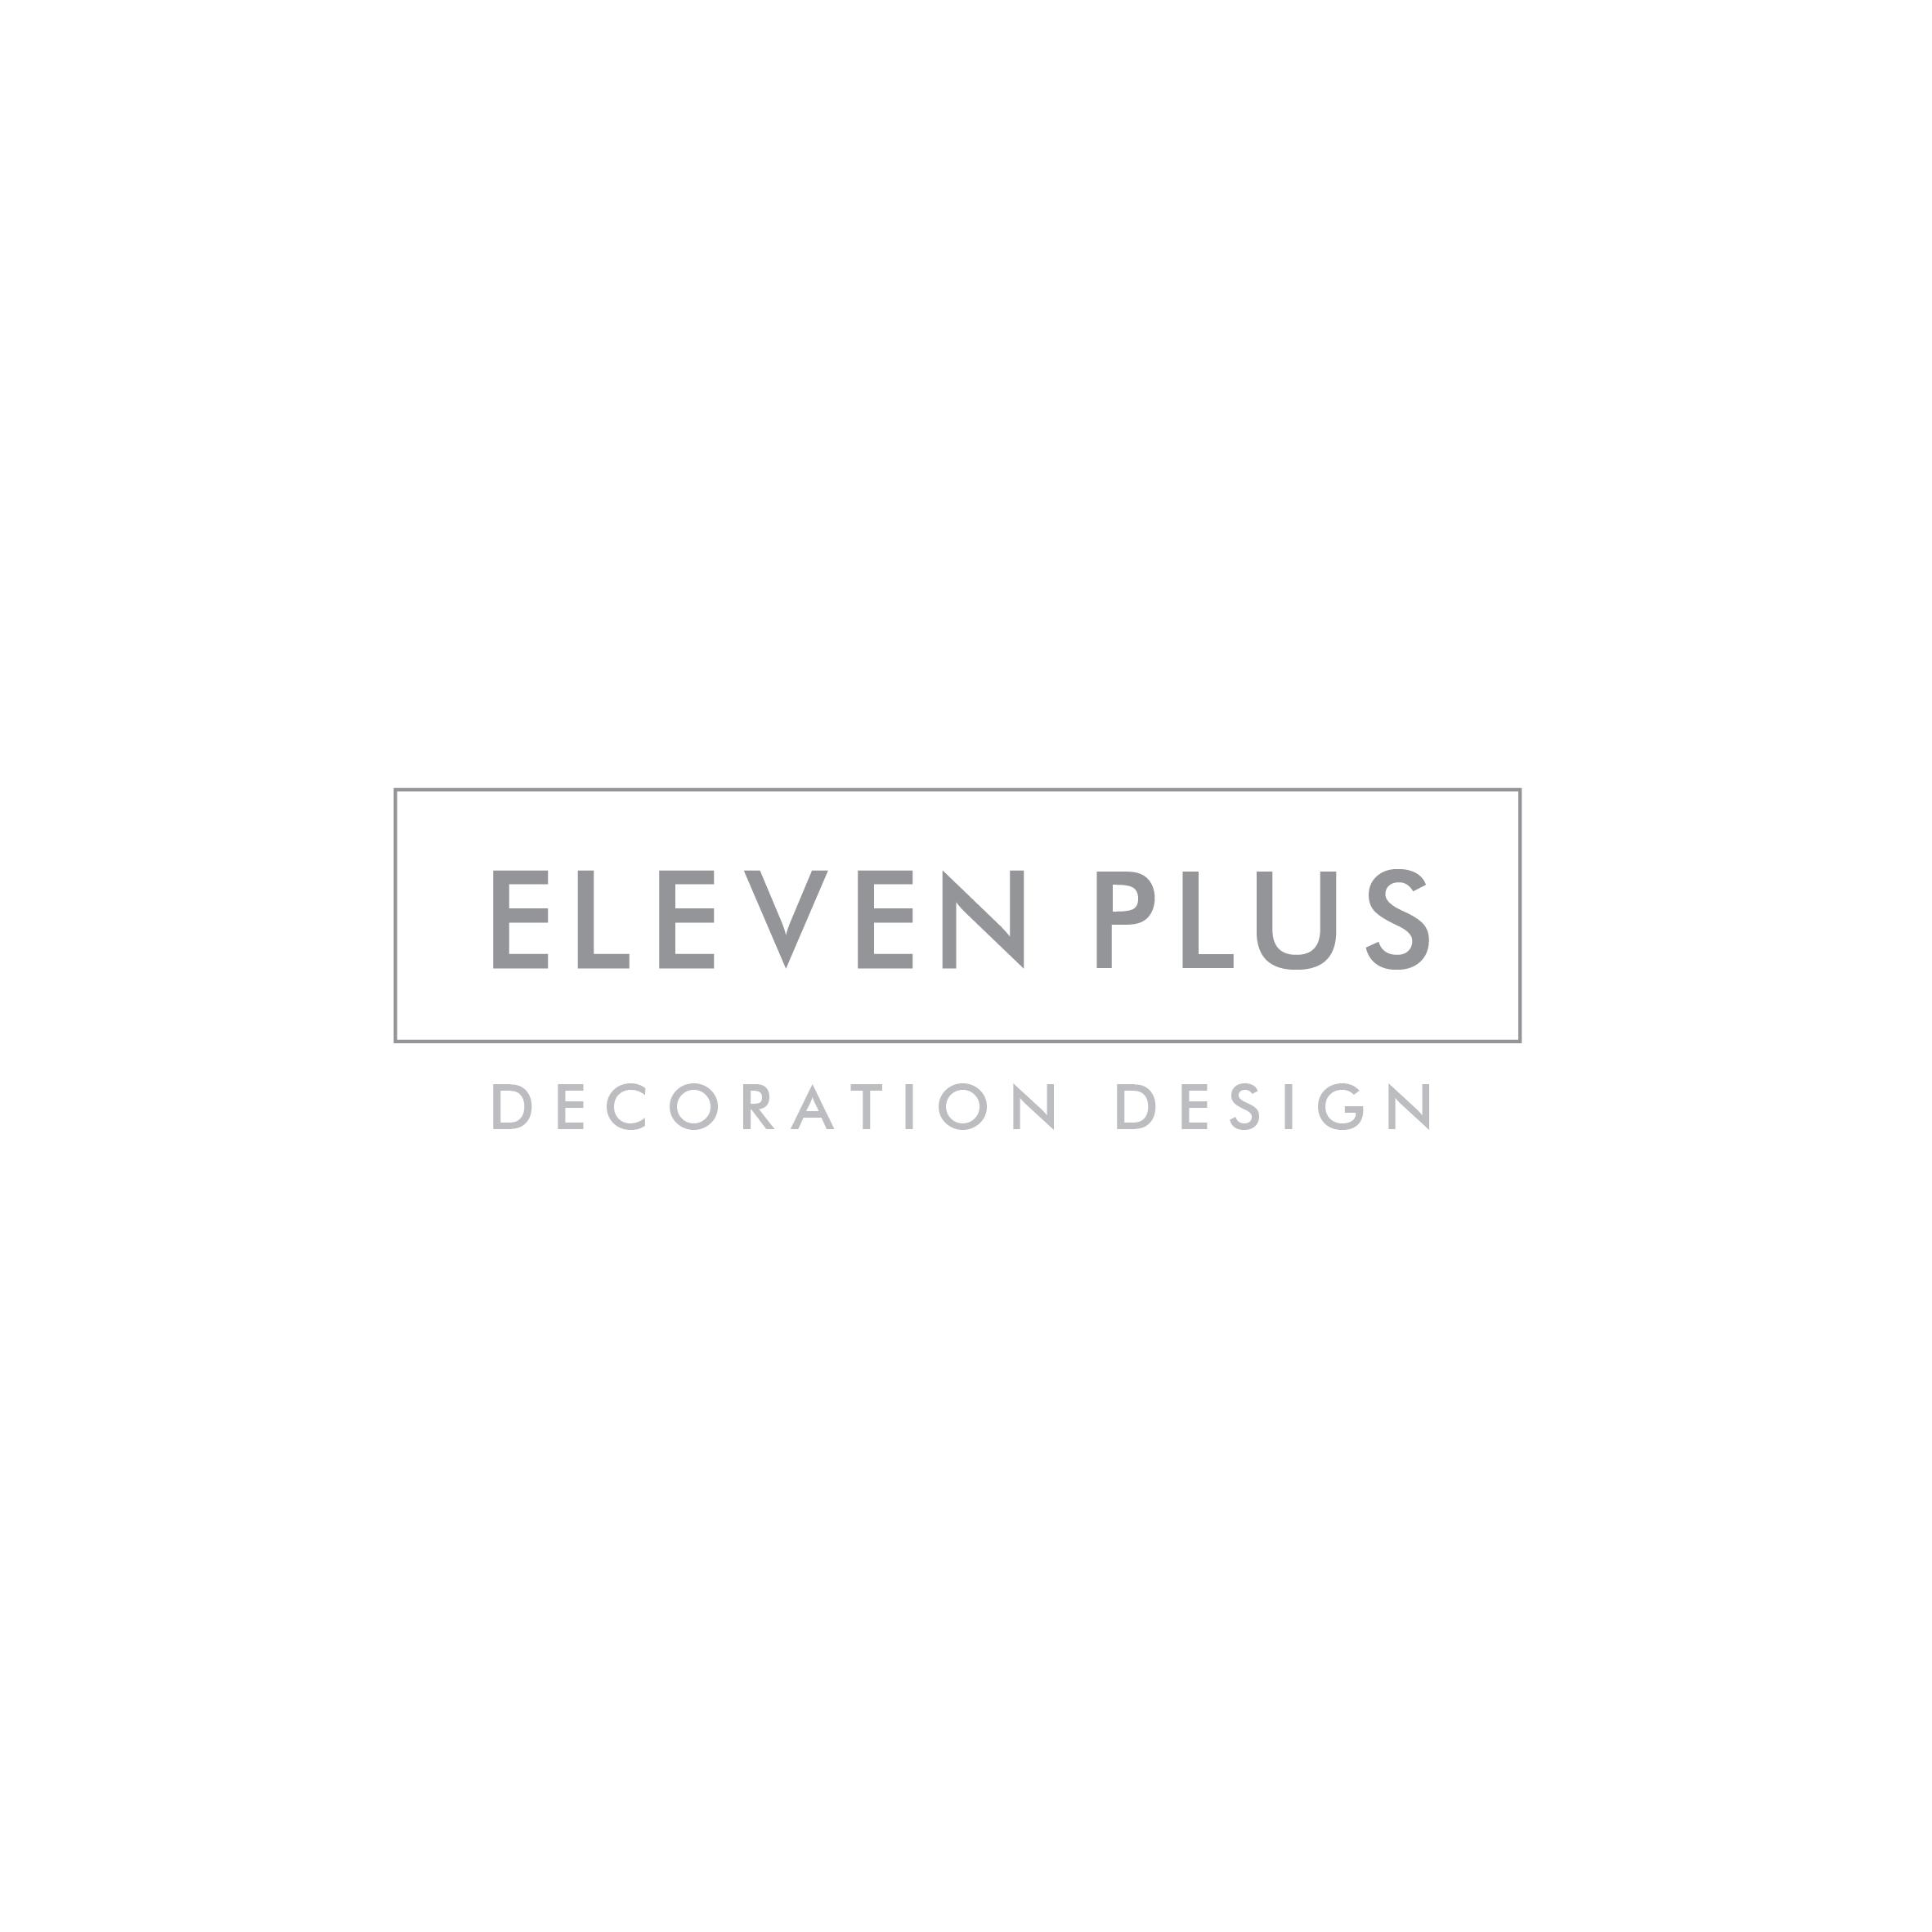 Eleven Plus Decoration Studio